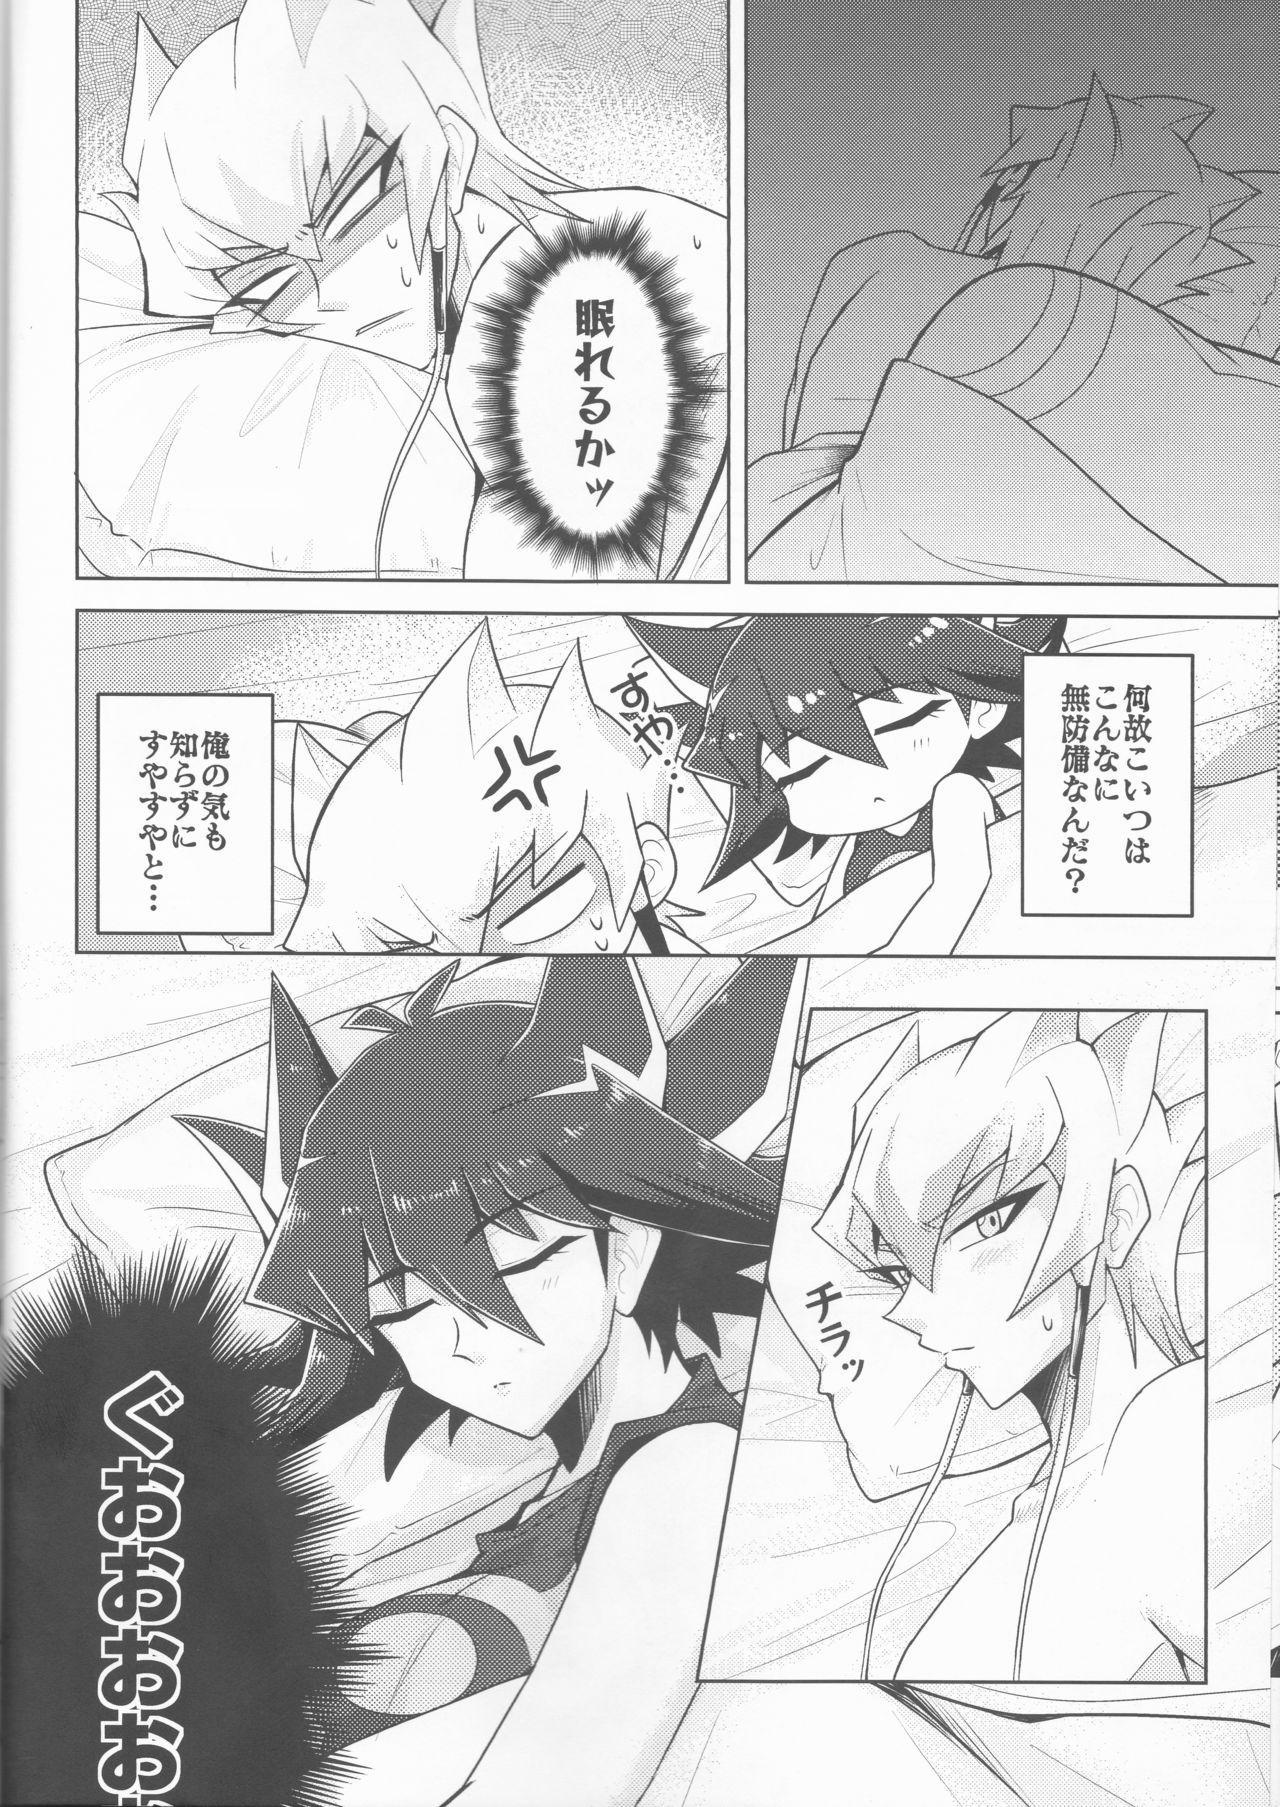 (Chou Ore no Turn 2019) [KINOPOTION (Take Nameko)] King (Mi) to Yusei-chan ♀ (Yu-Gi-Oh! 5D's) 5